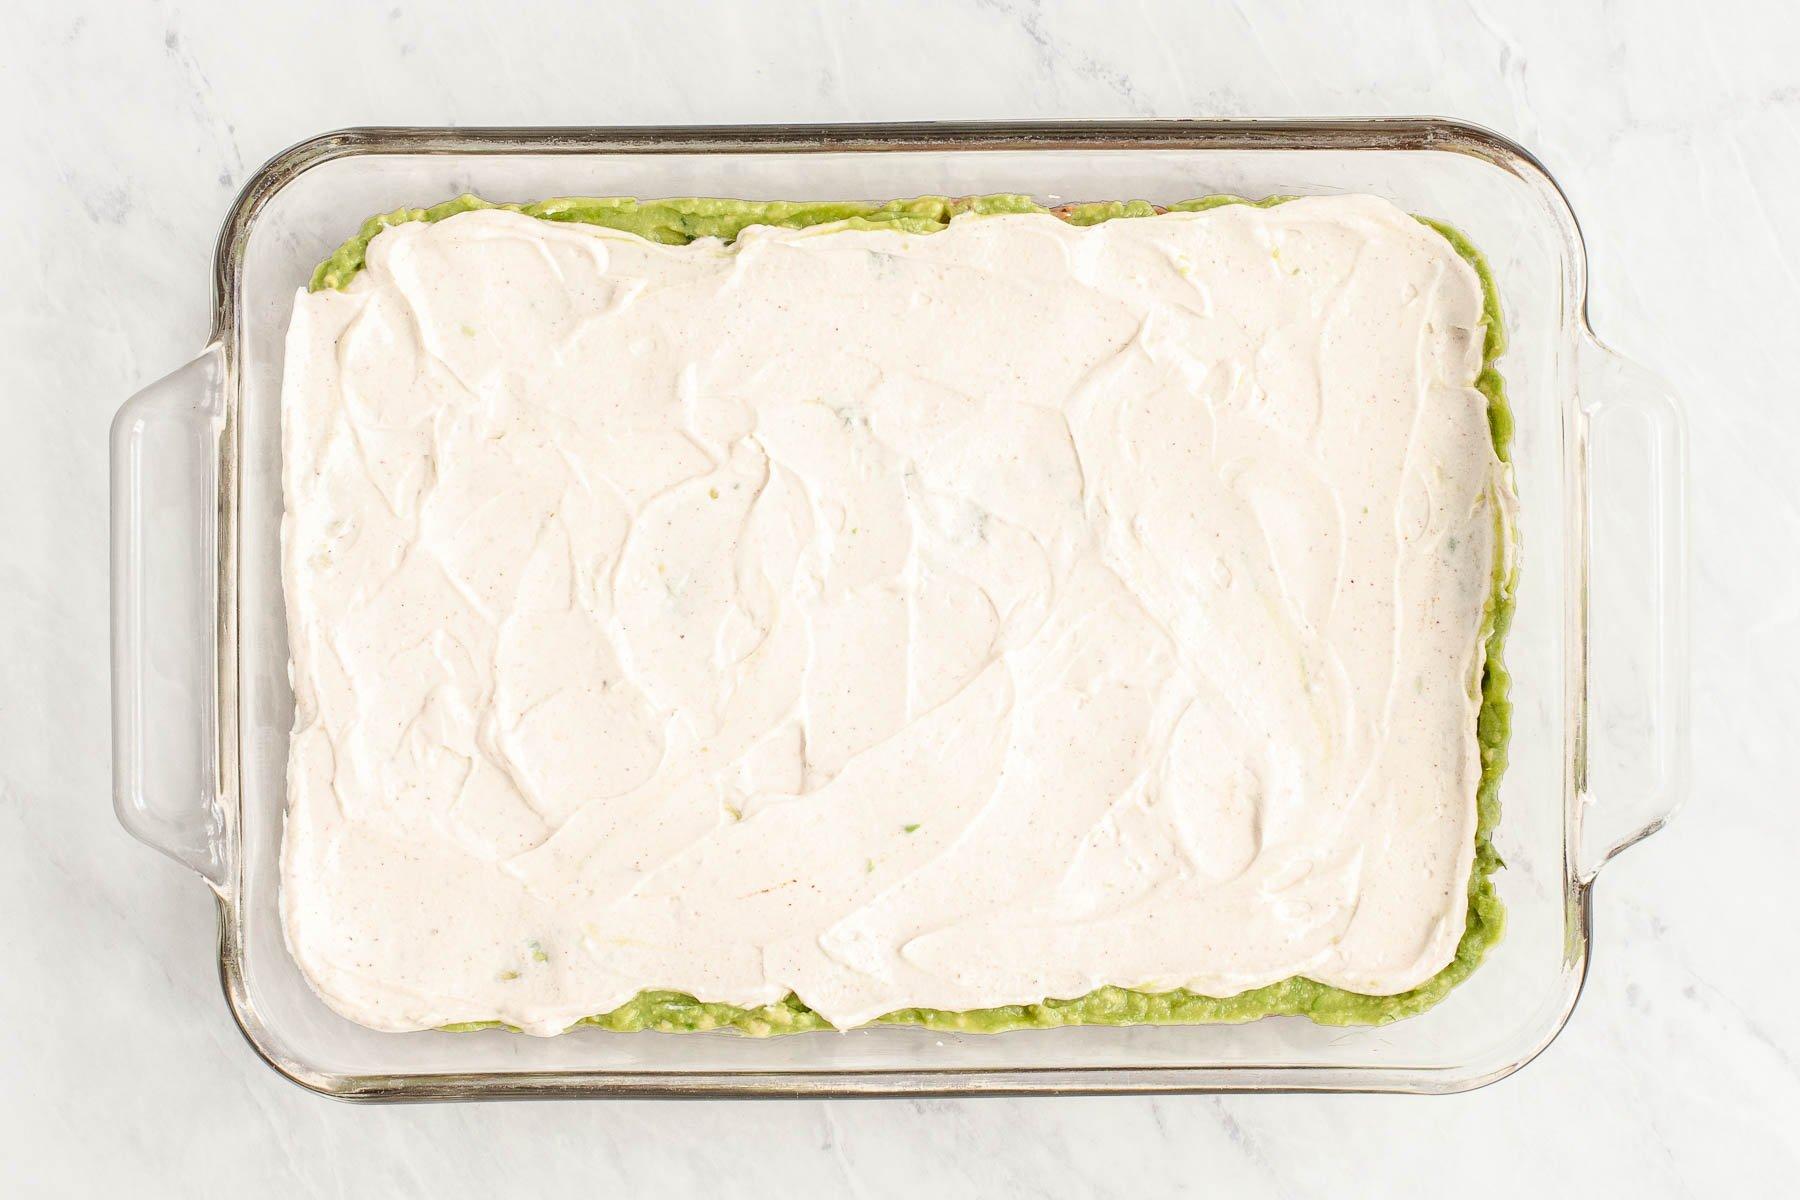 Sour cream spread in a clear glass dish.